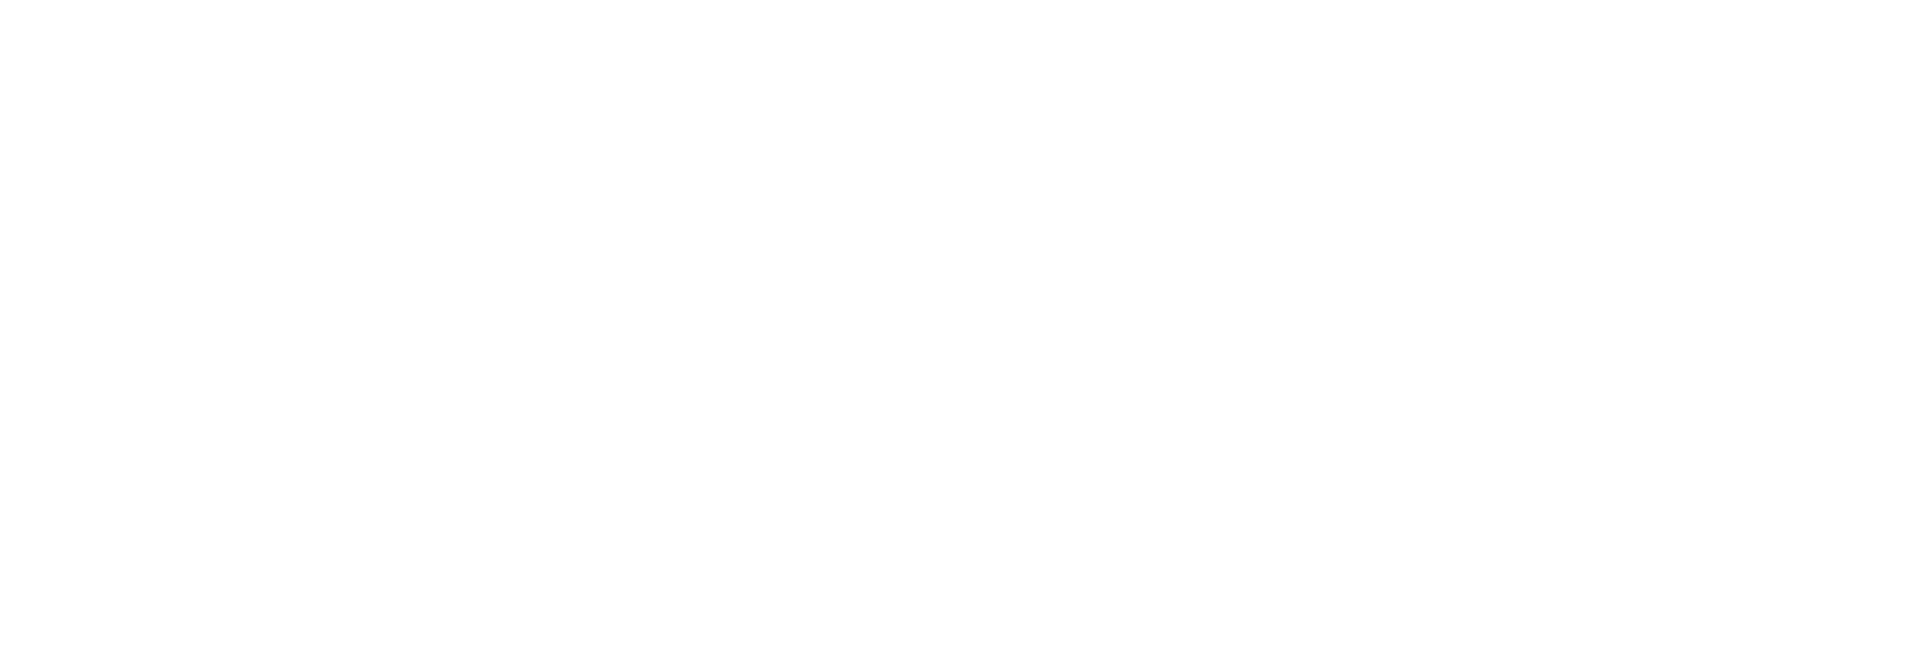 formateurs hydrauliques fci formations - contours